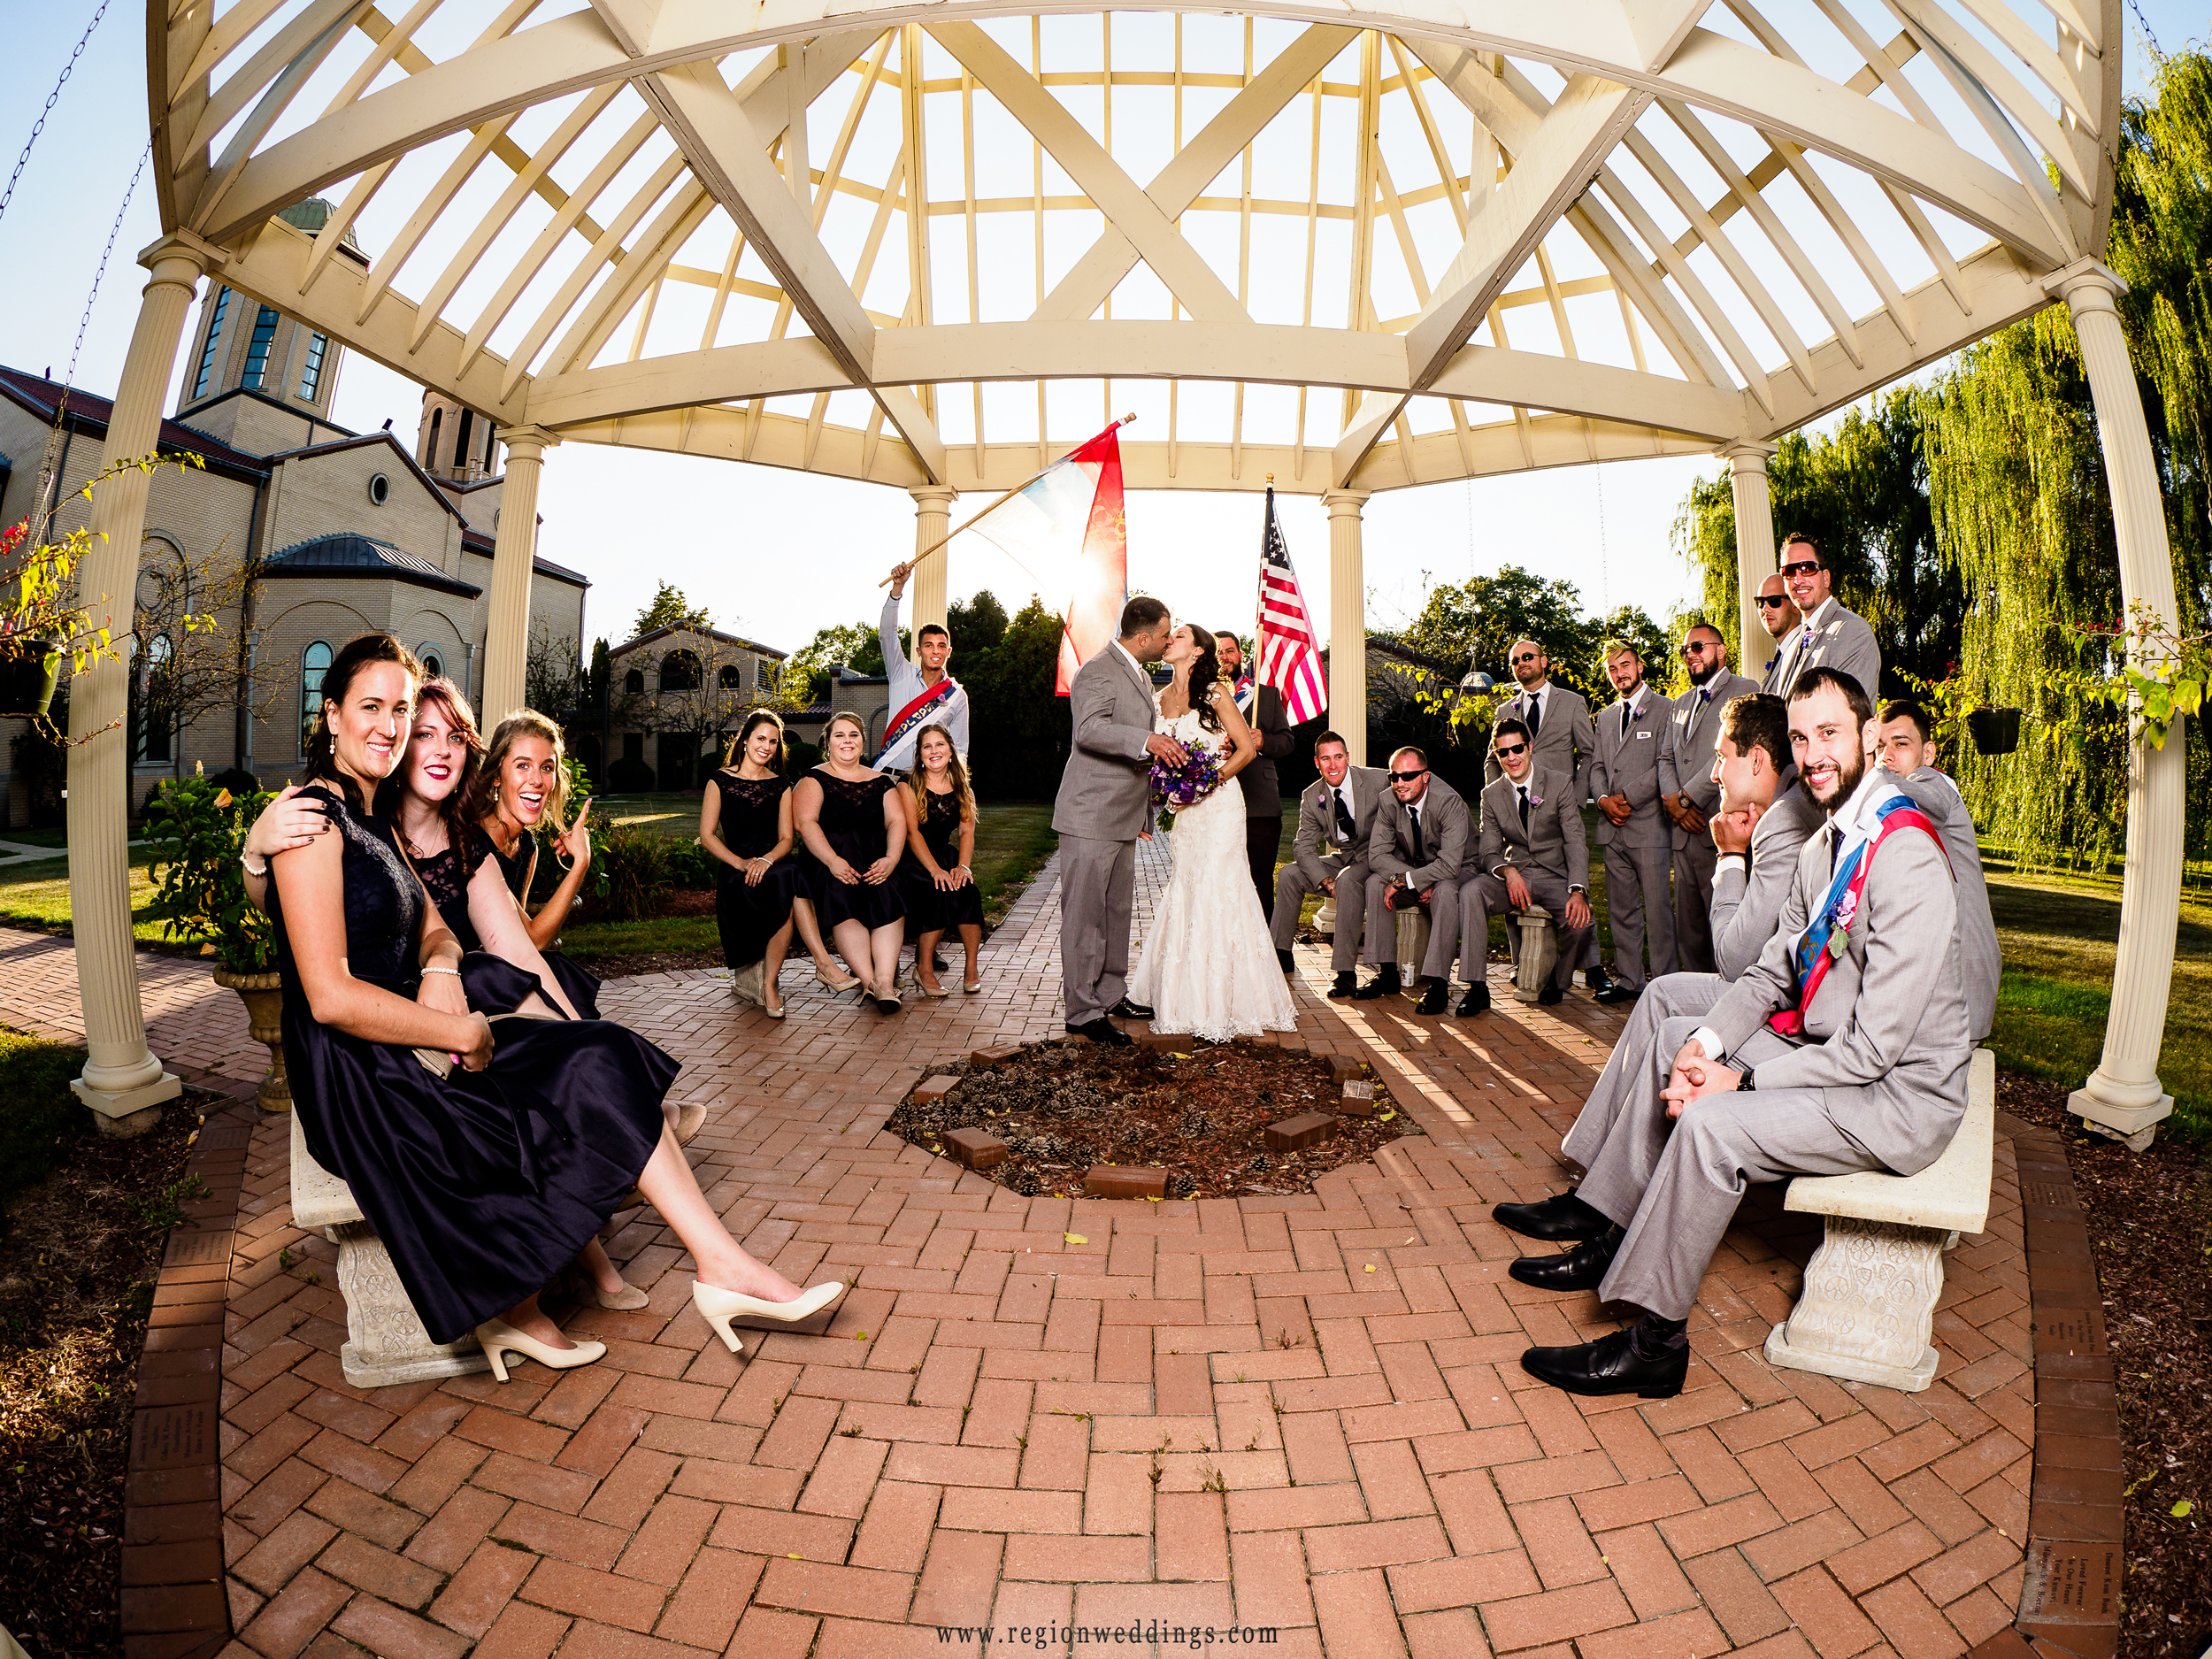 A fun wedding party photo under the gazebo at Serbian Social Center in Lansing, Illinois.